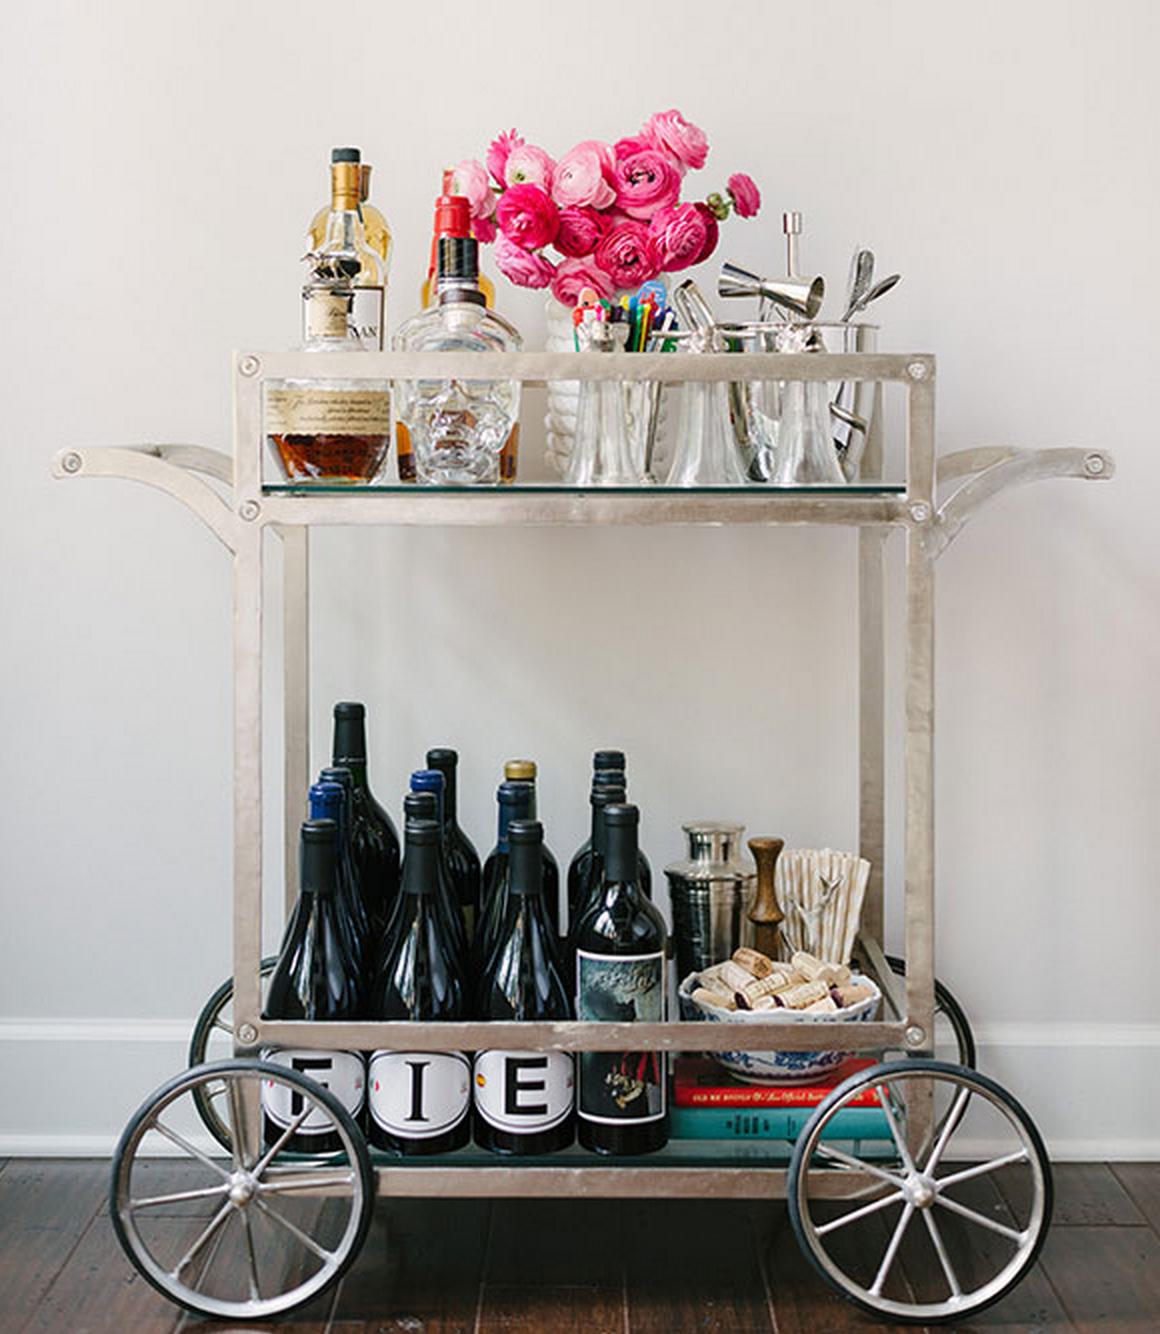 Paige S Picks The Modern Vintage Bar Cart The Vintage Round Top